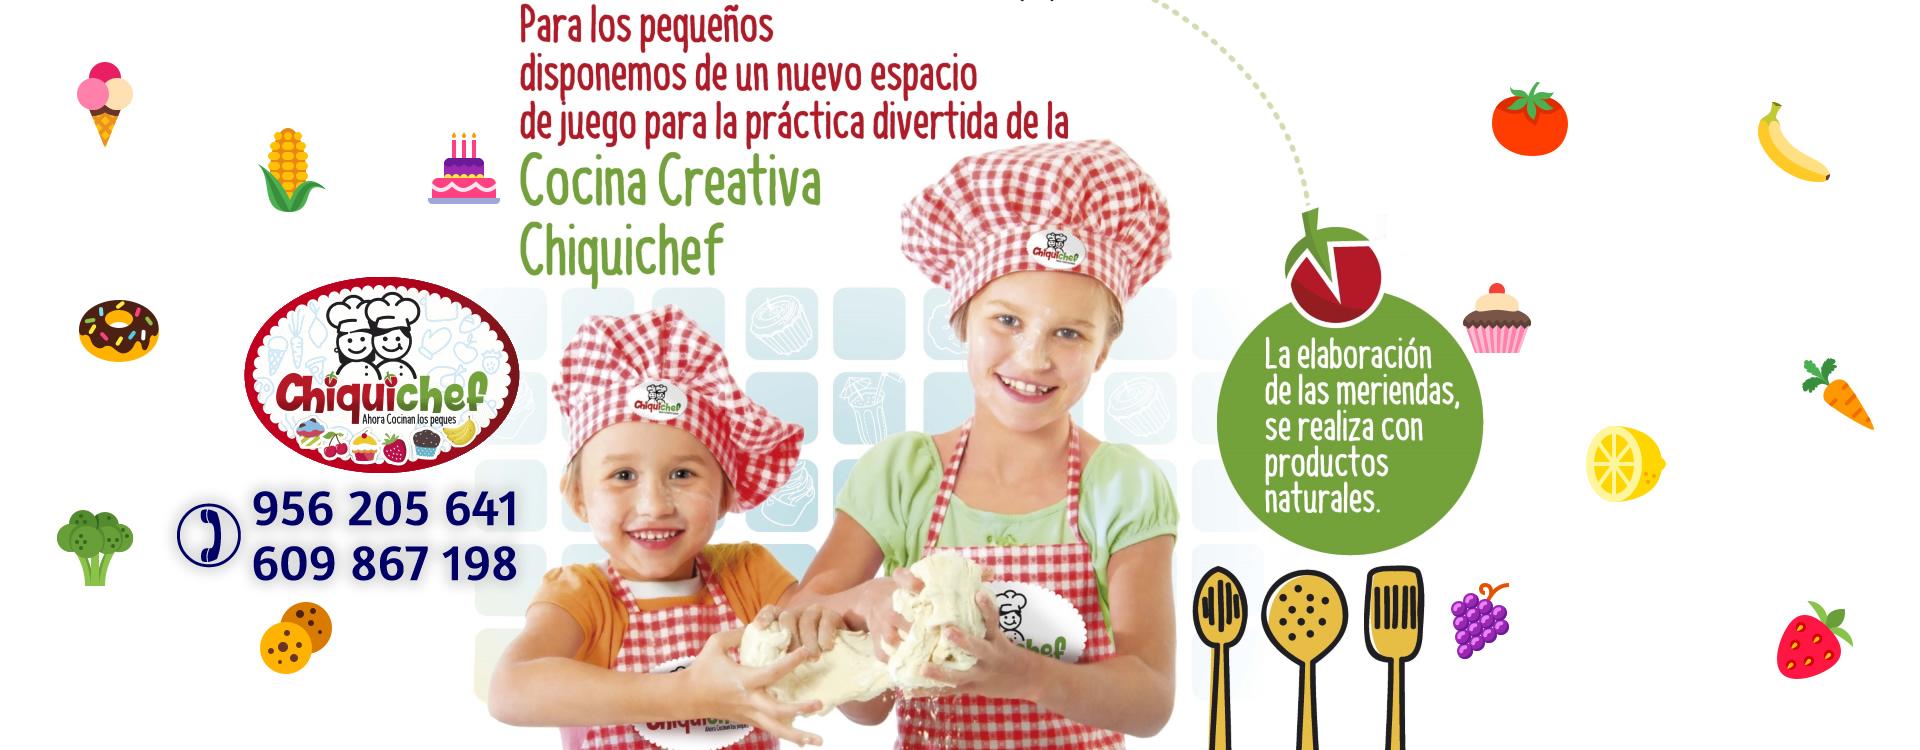 Cocina creativa para peques en Chiquichef Cádiz